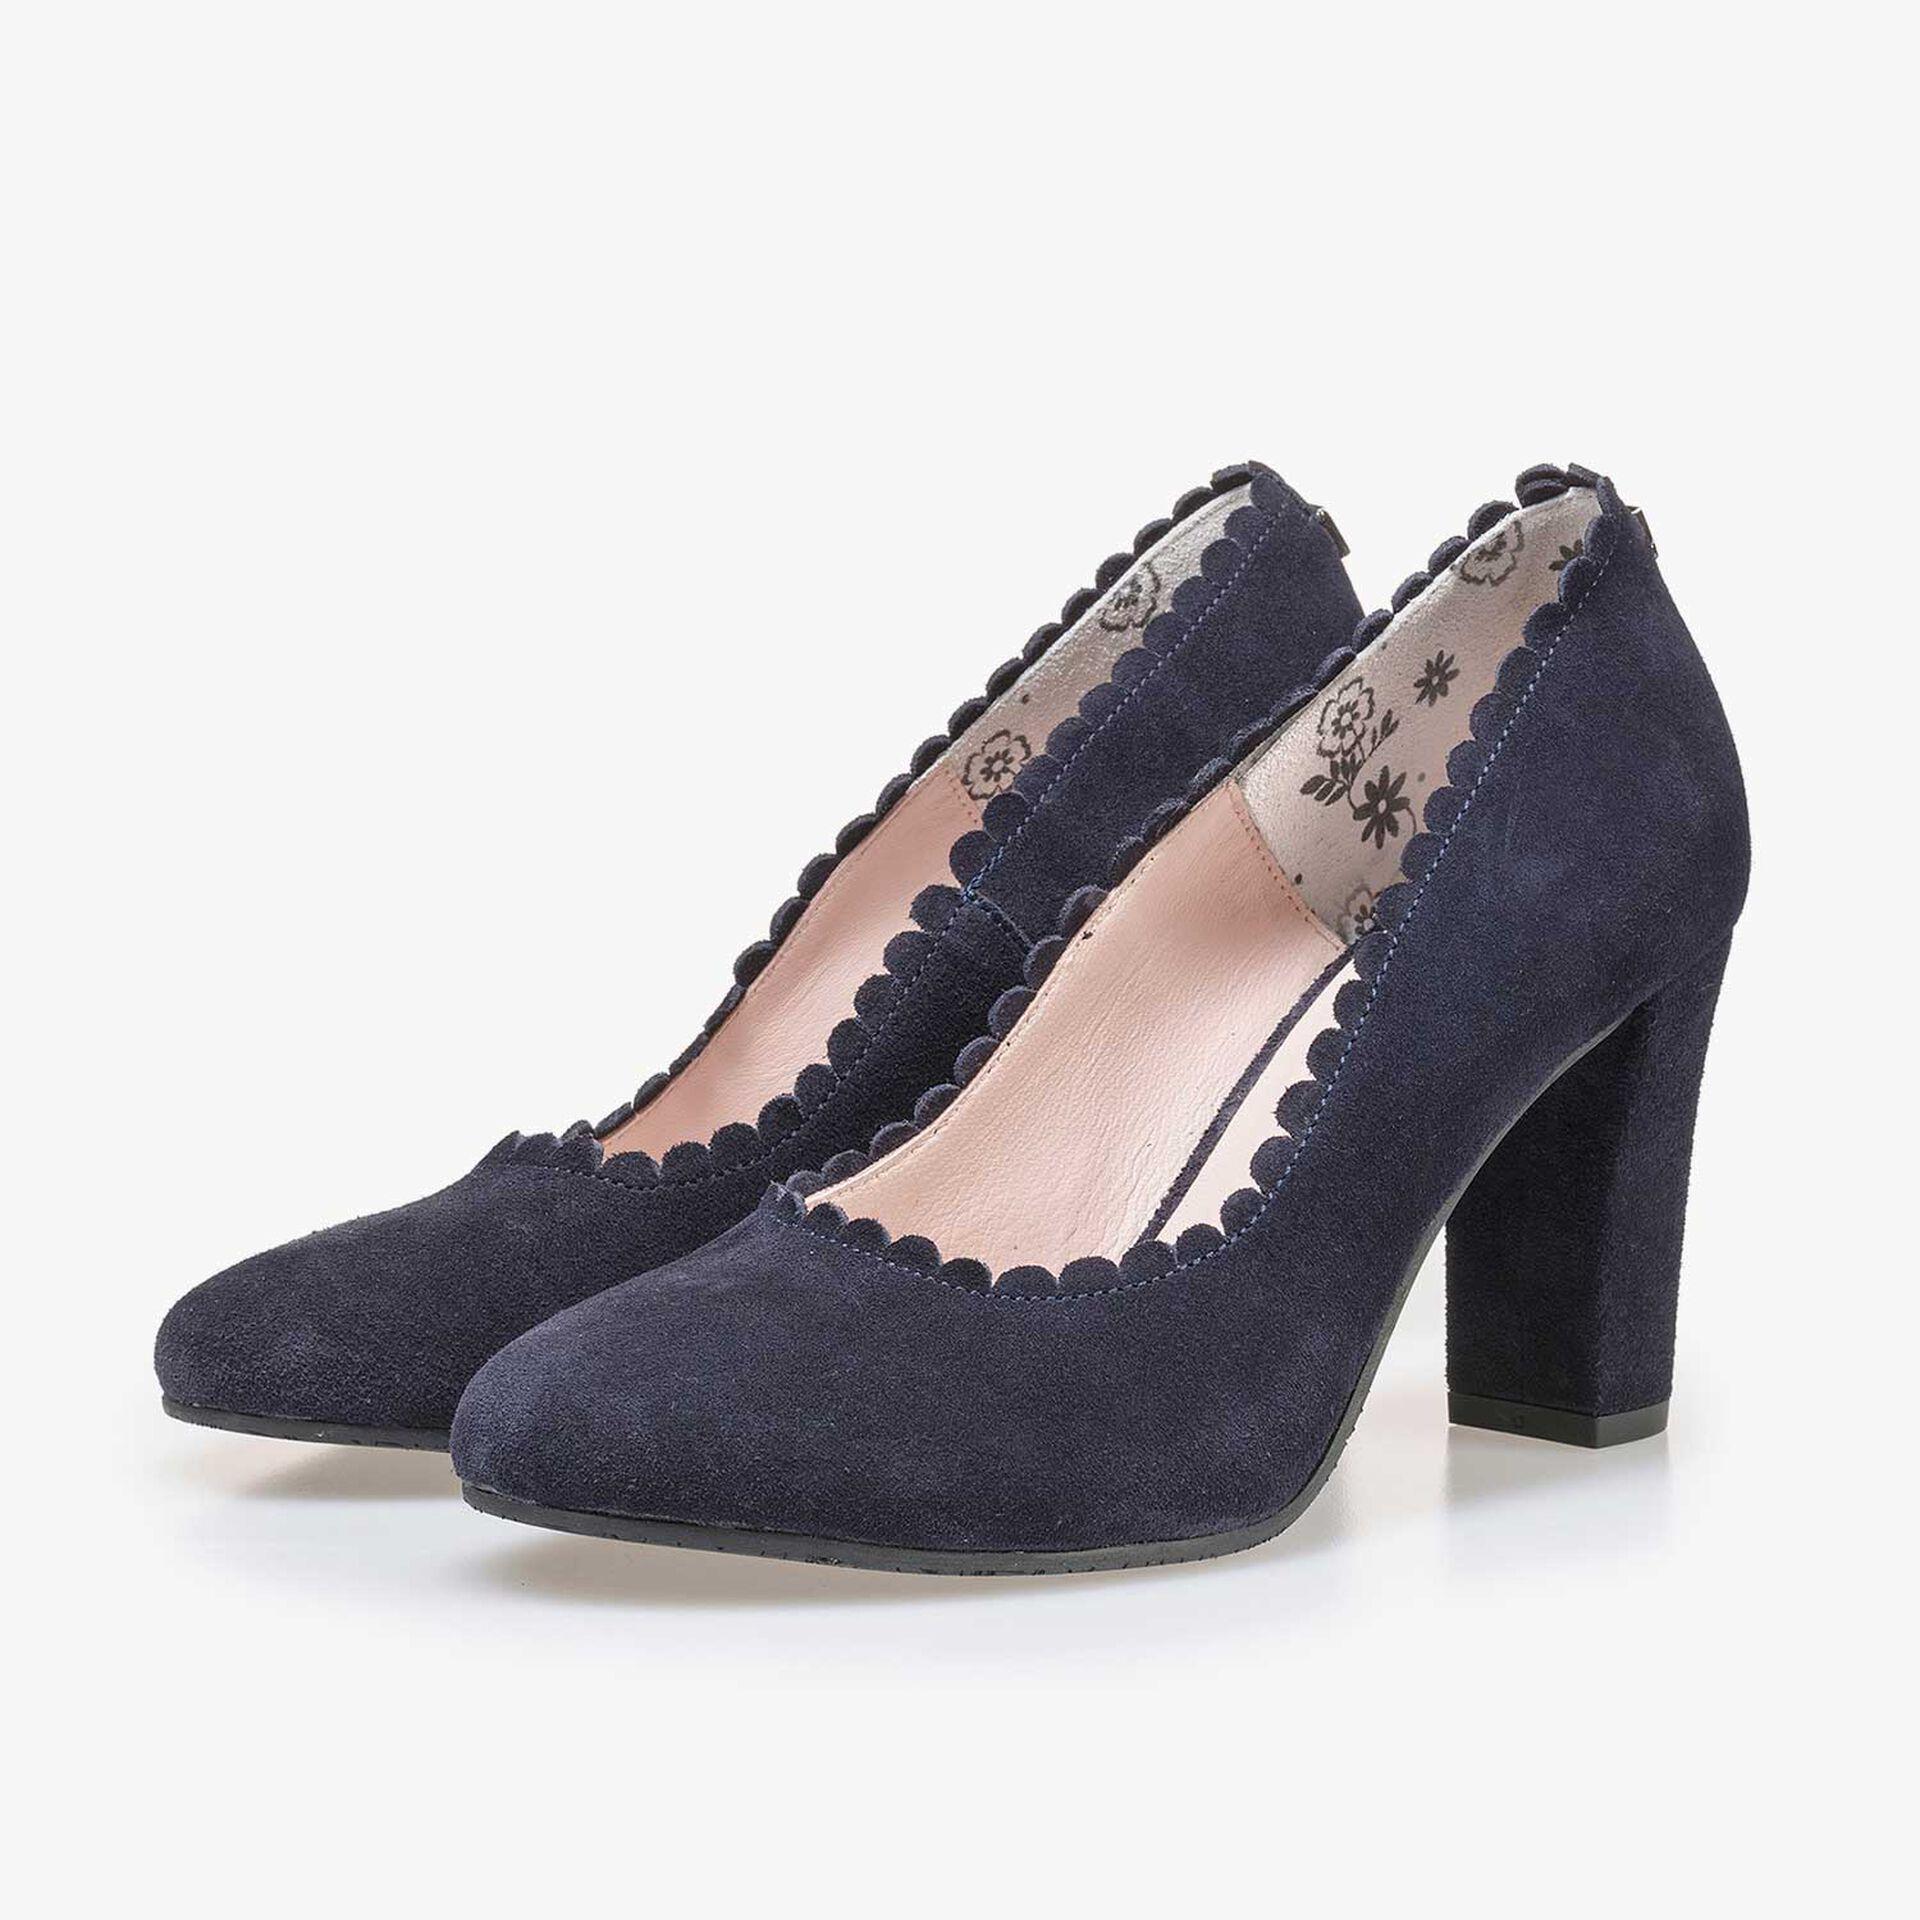 Dark blue calf's suede leather pumps